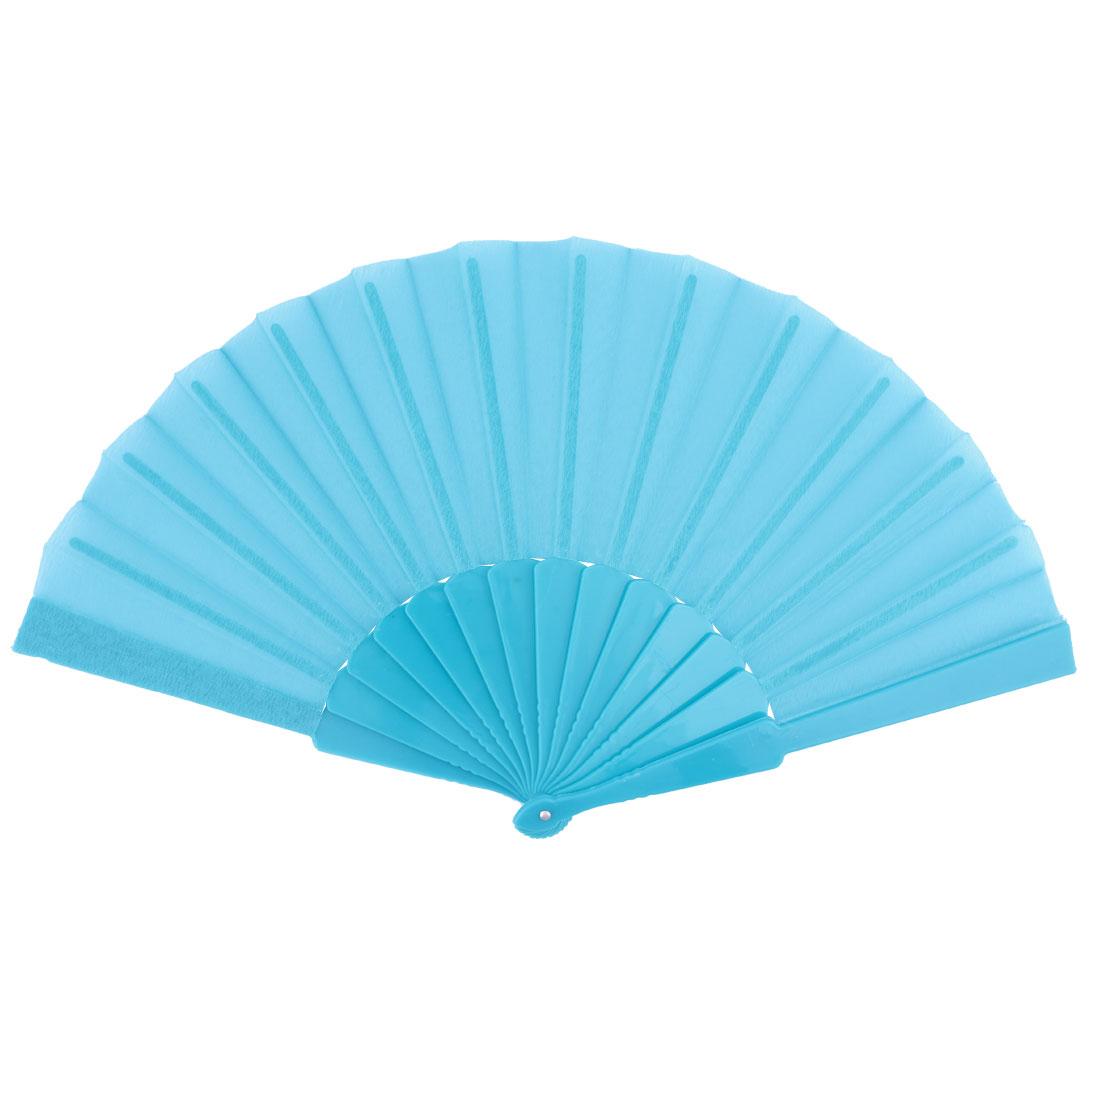 Woman Party Show Plastic Frame Portable Handheld Folding Fan Ornament Sky Blue